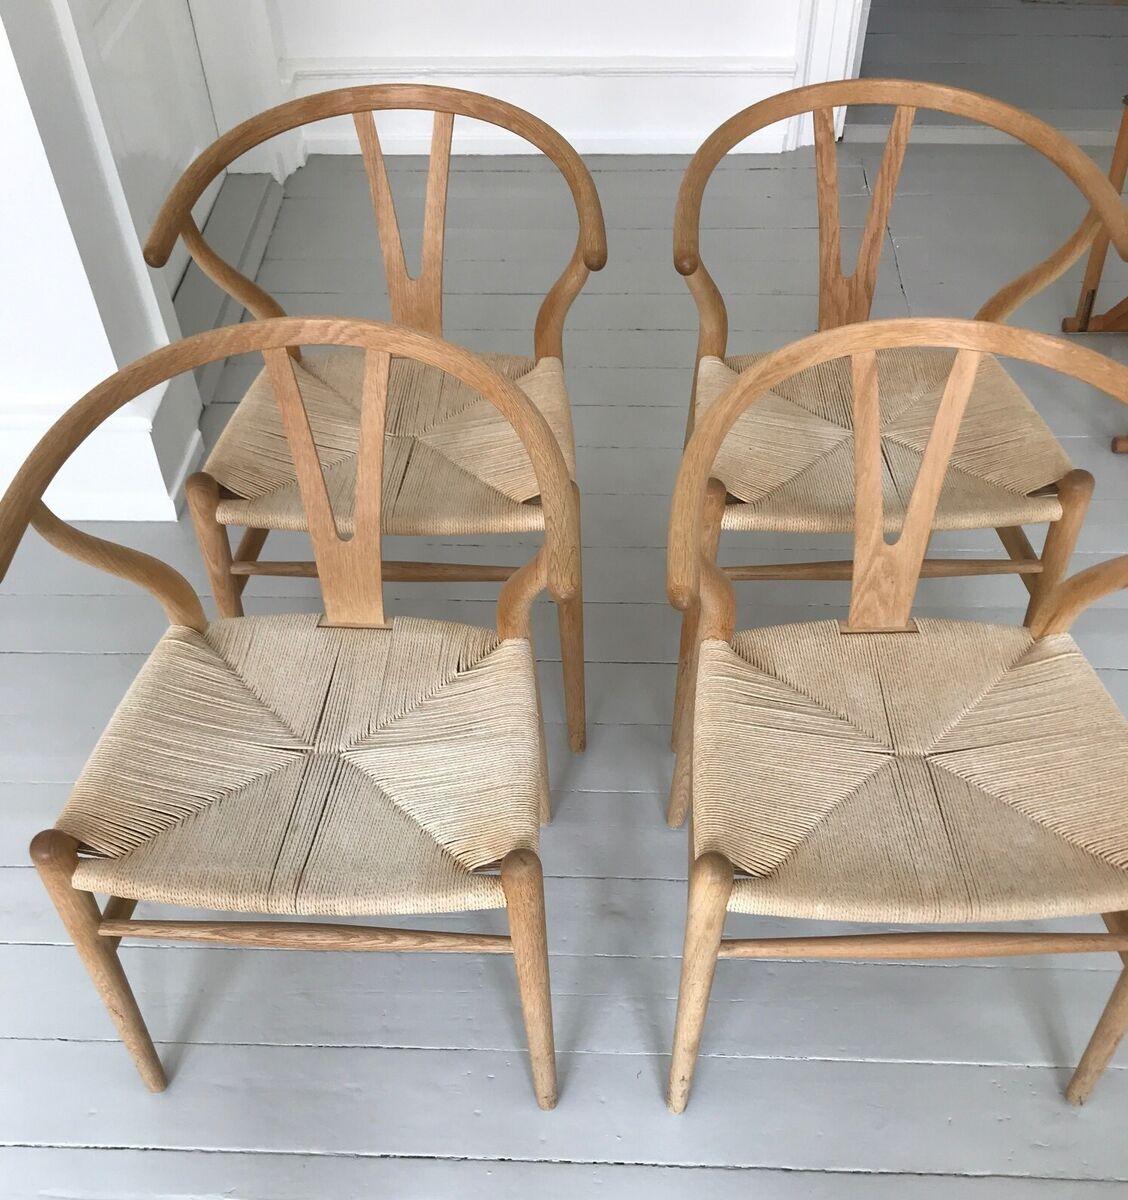 Wegner, Y stol, 4 stk. Y stol i sæbebehandlet eg. Produce